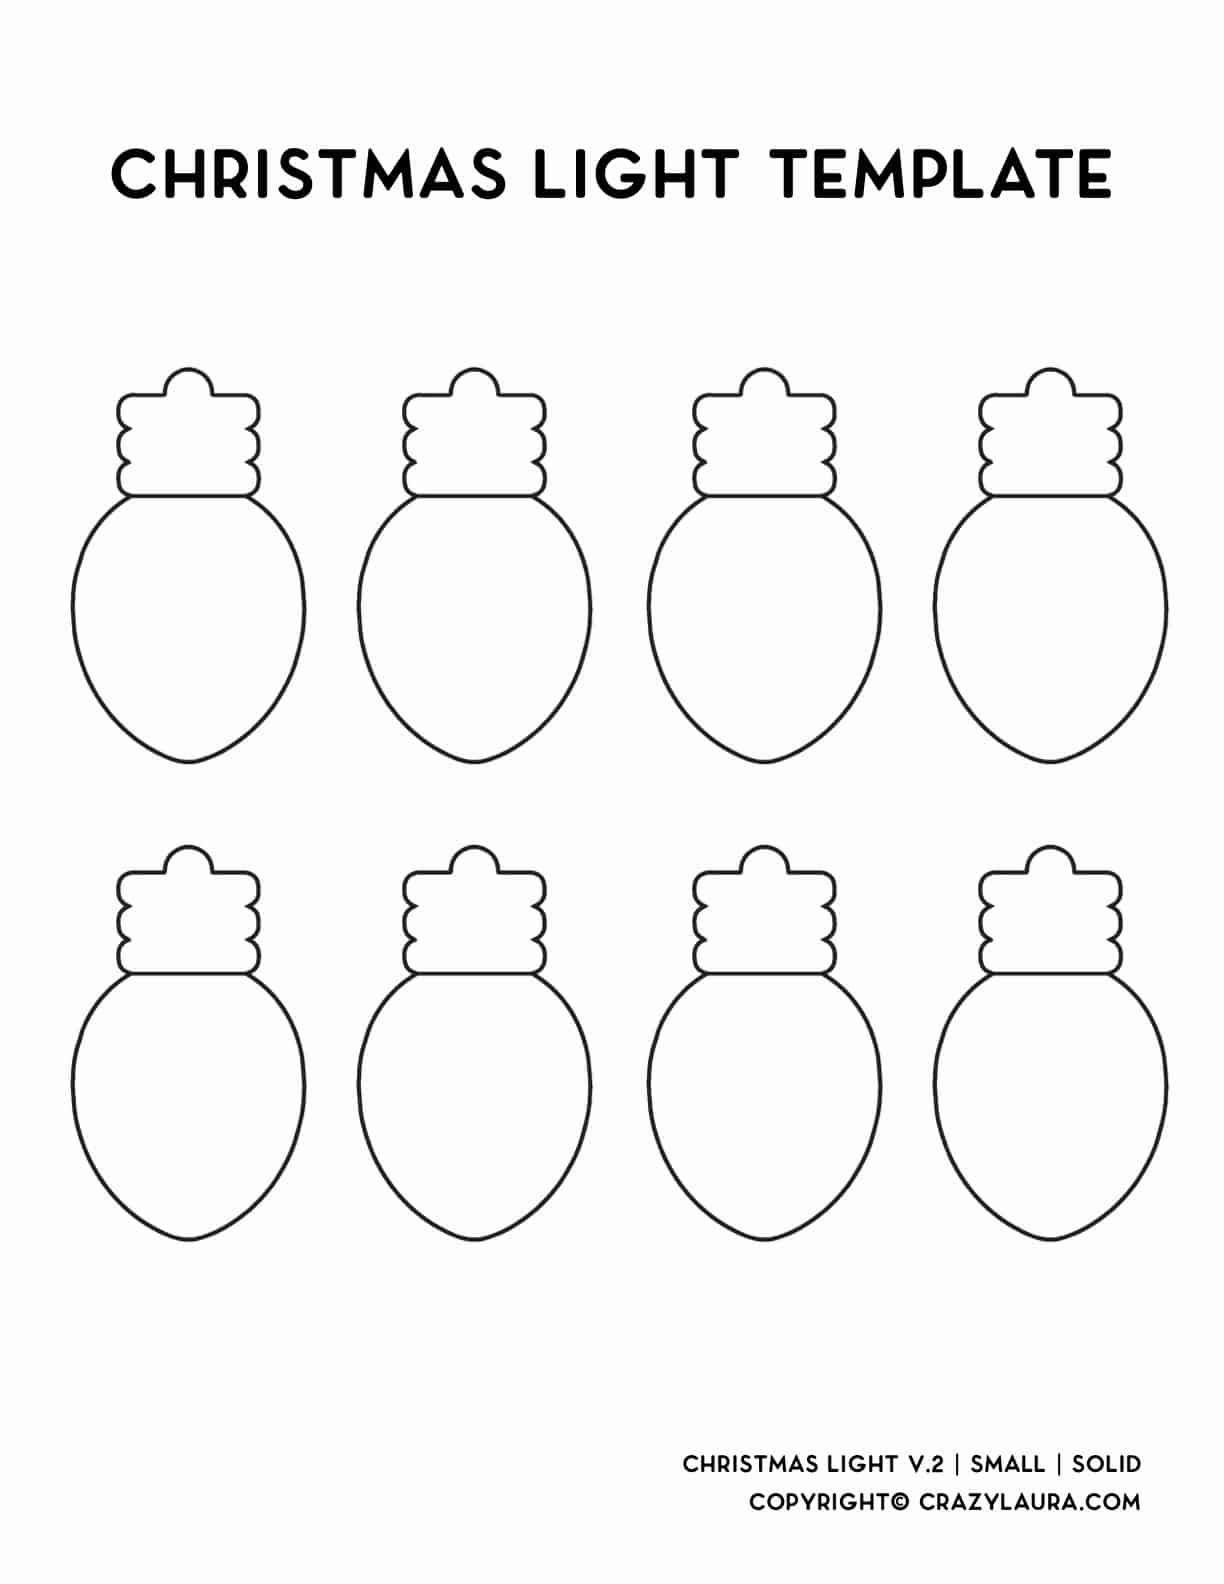 small garland template for christmas lights